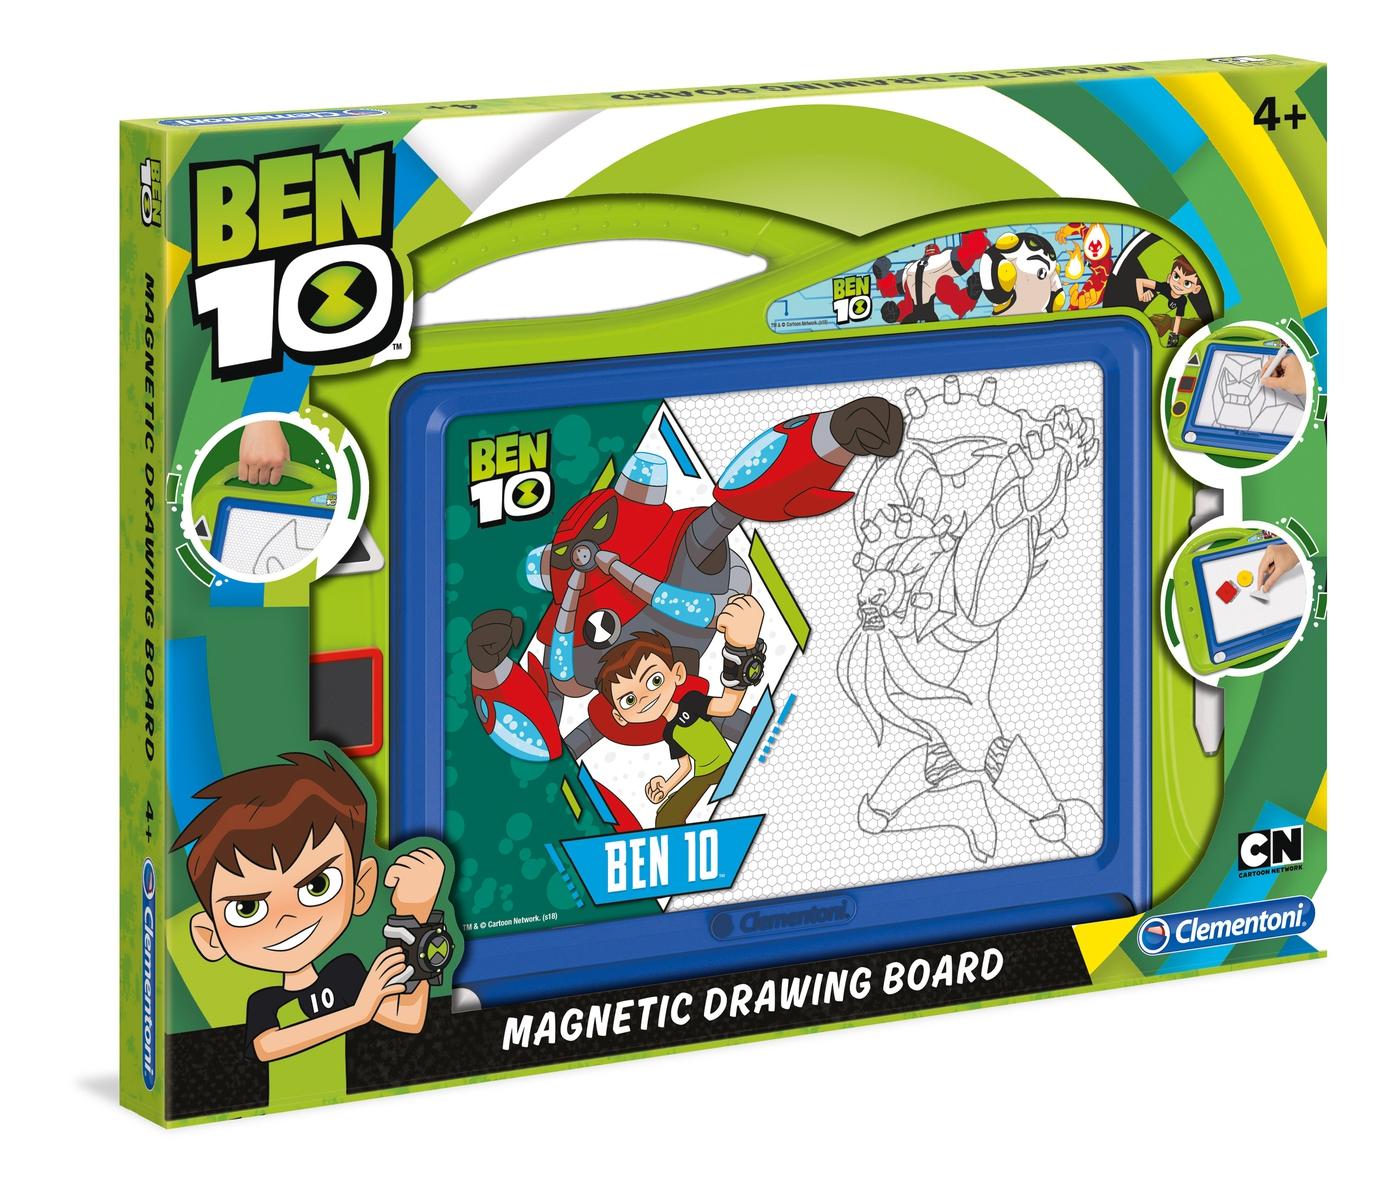 Ben 10 Magnetic Drawing Board Clementoni